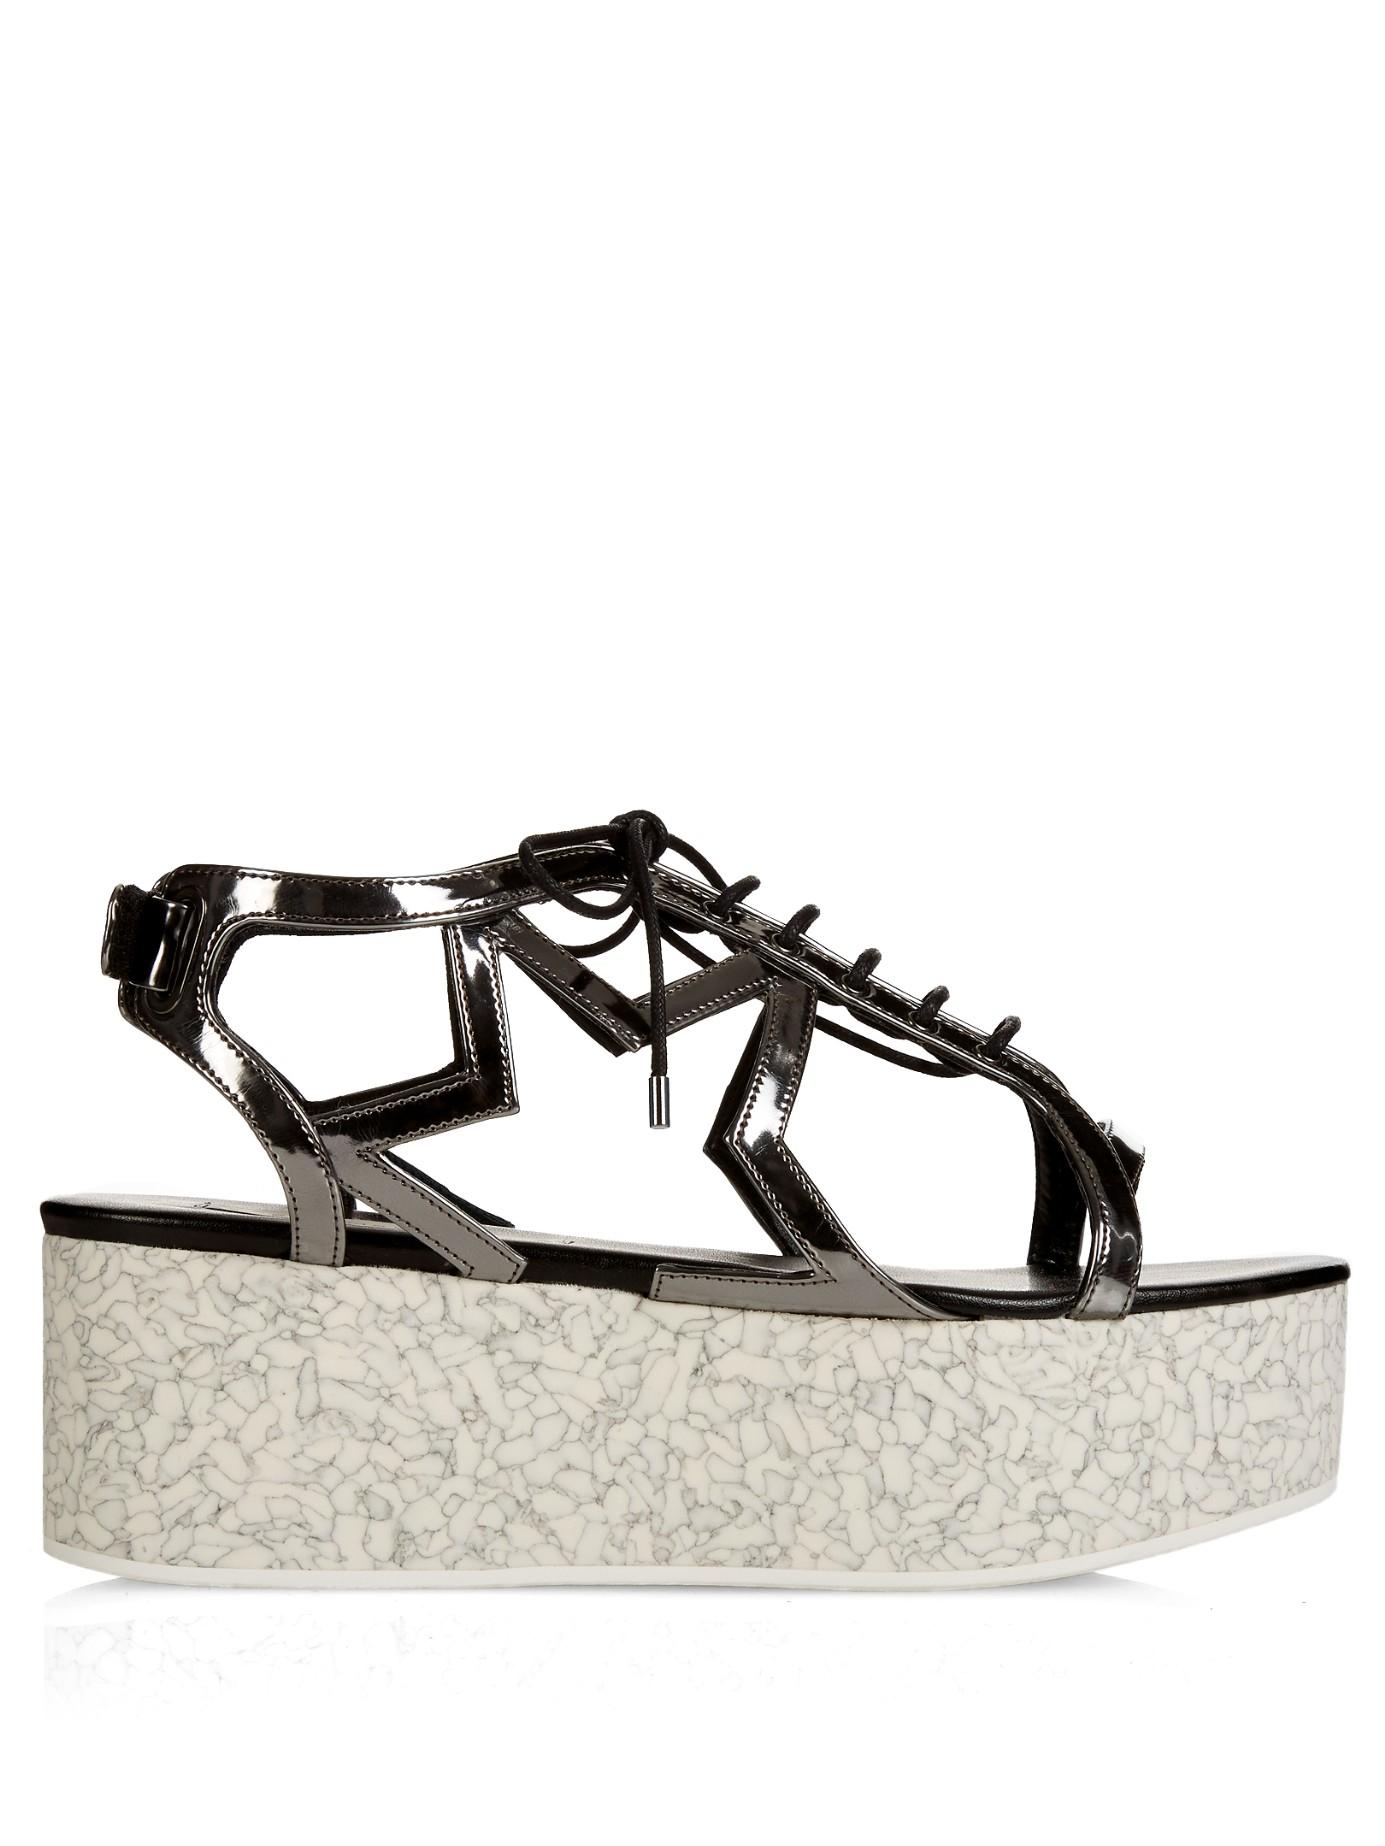 50b88c38c5a2 Stella McCartney Lucy Star Metallic Faux Leather Platform Sandals in ...